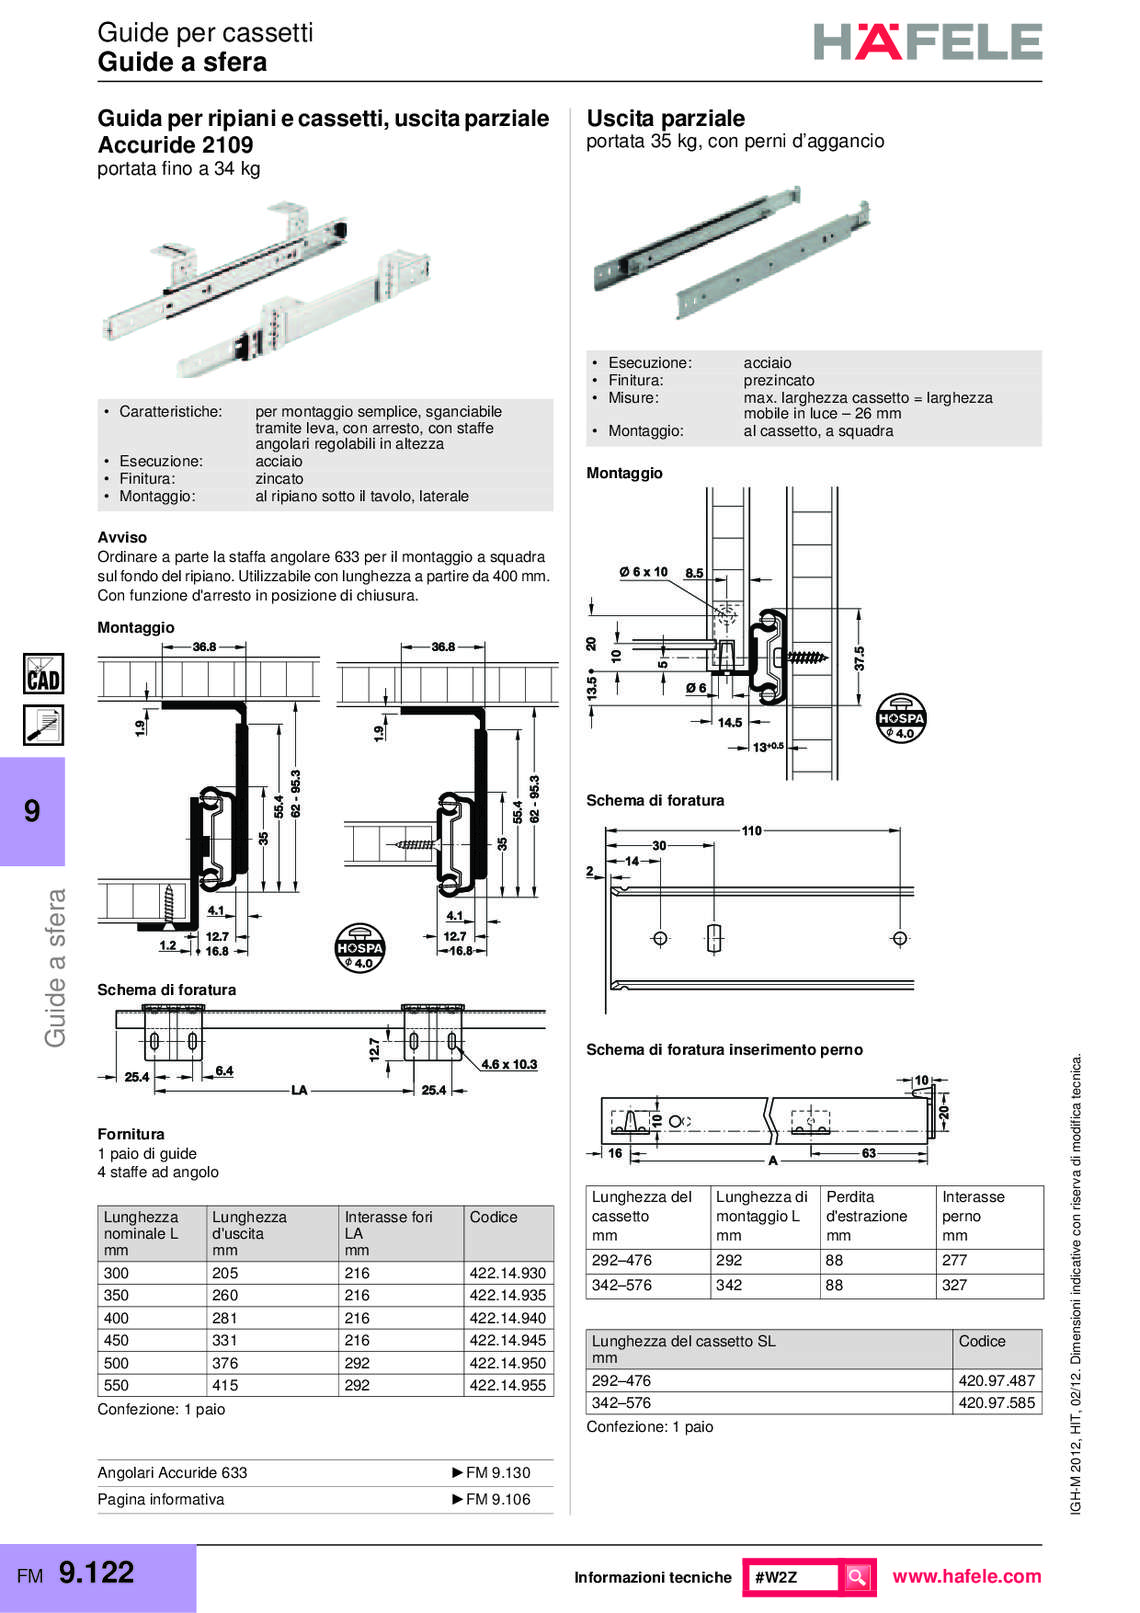 hafele-spondine-e-guide-per-mobili_40_175.jpg